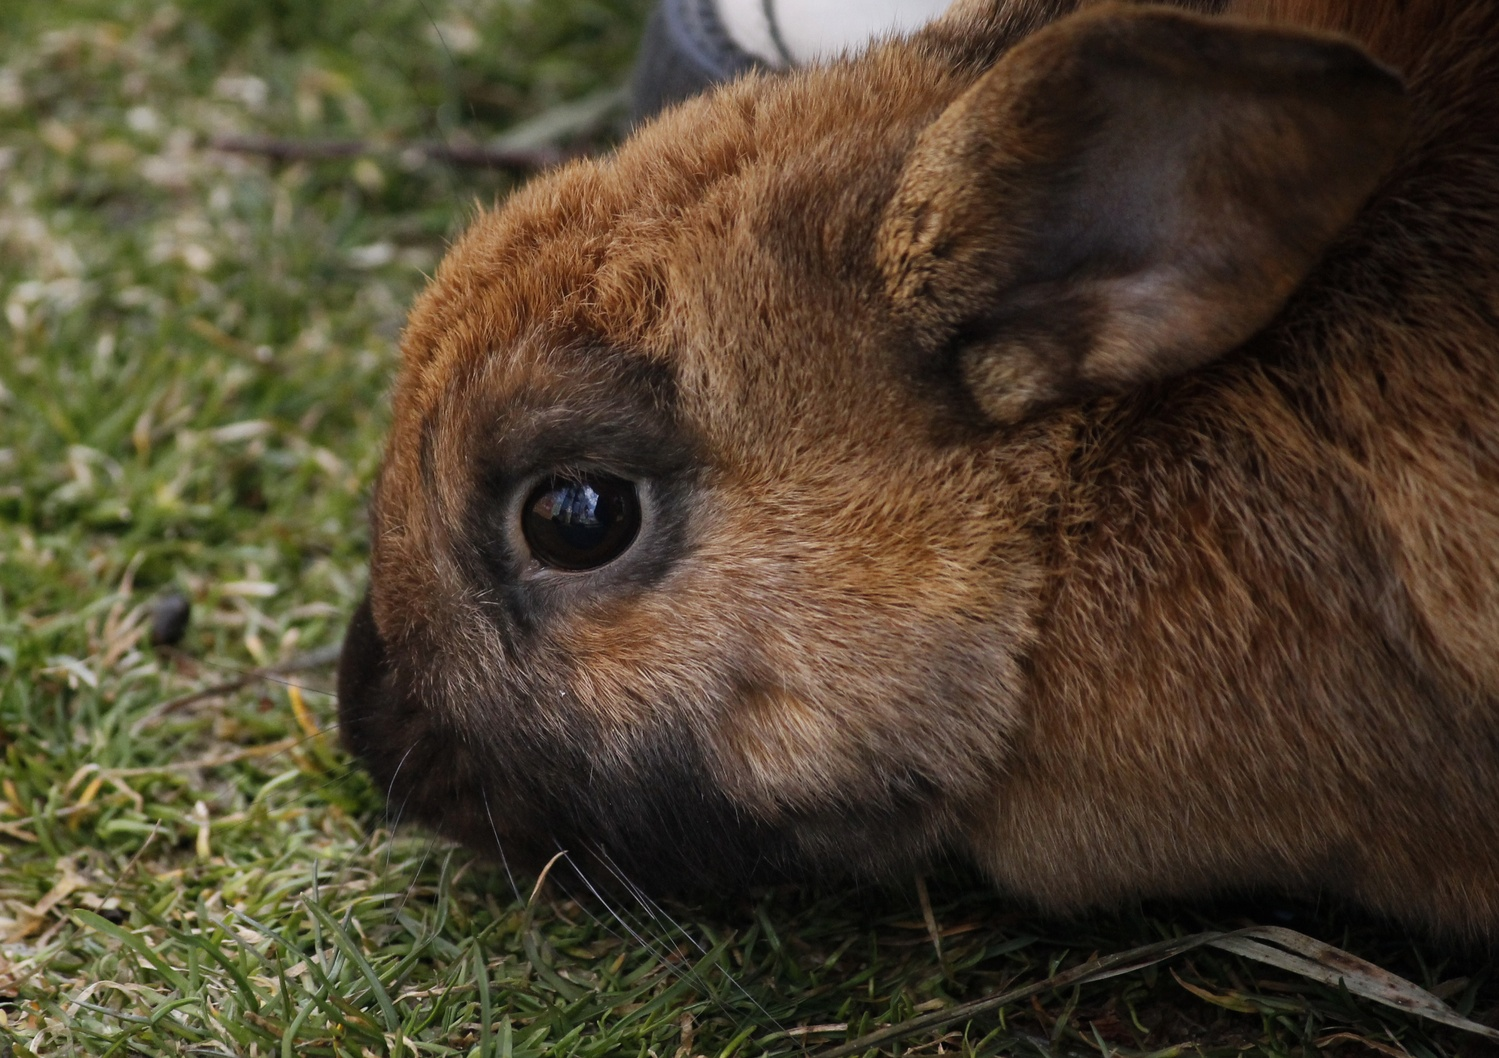 Bunnies Take the Quad